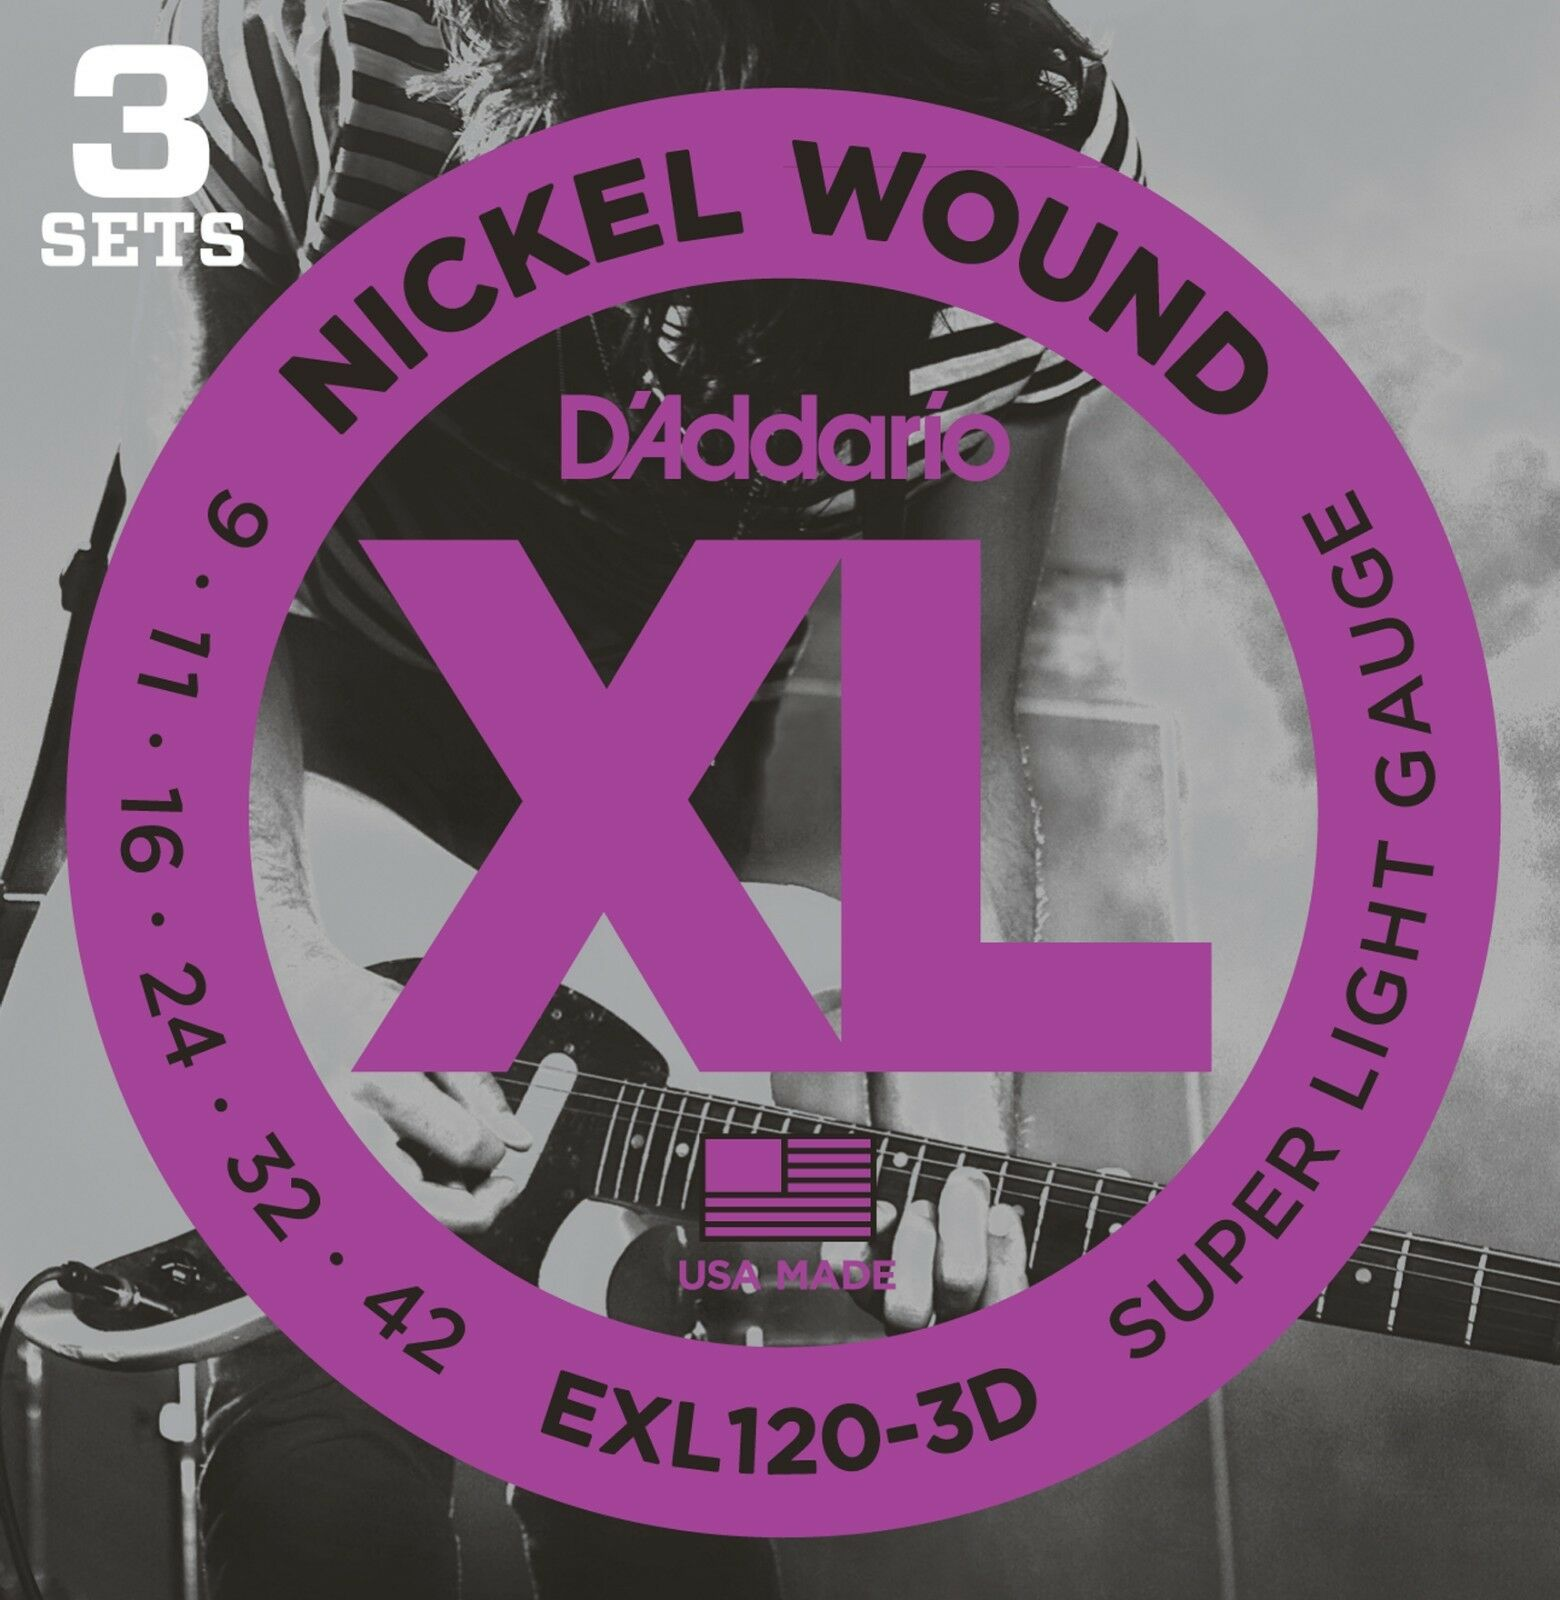 3 Sets D'Addario EXL120 Electric Guitar Strings 9-42 Super Light exl120-3D